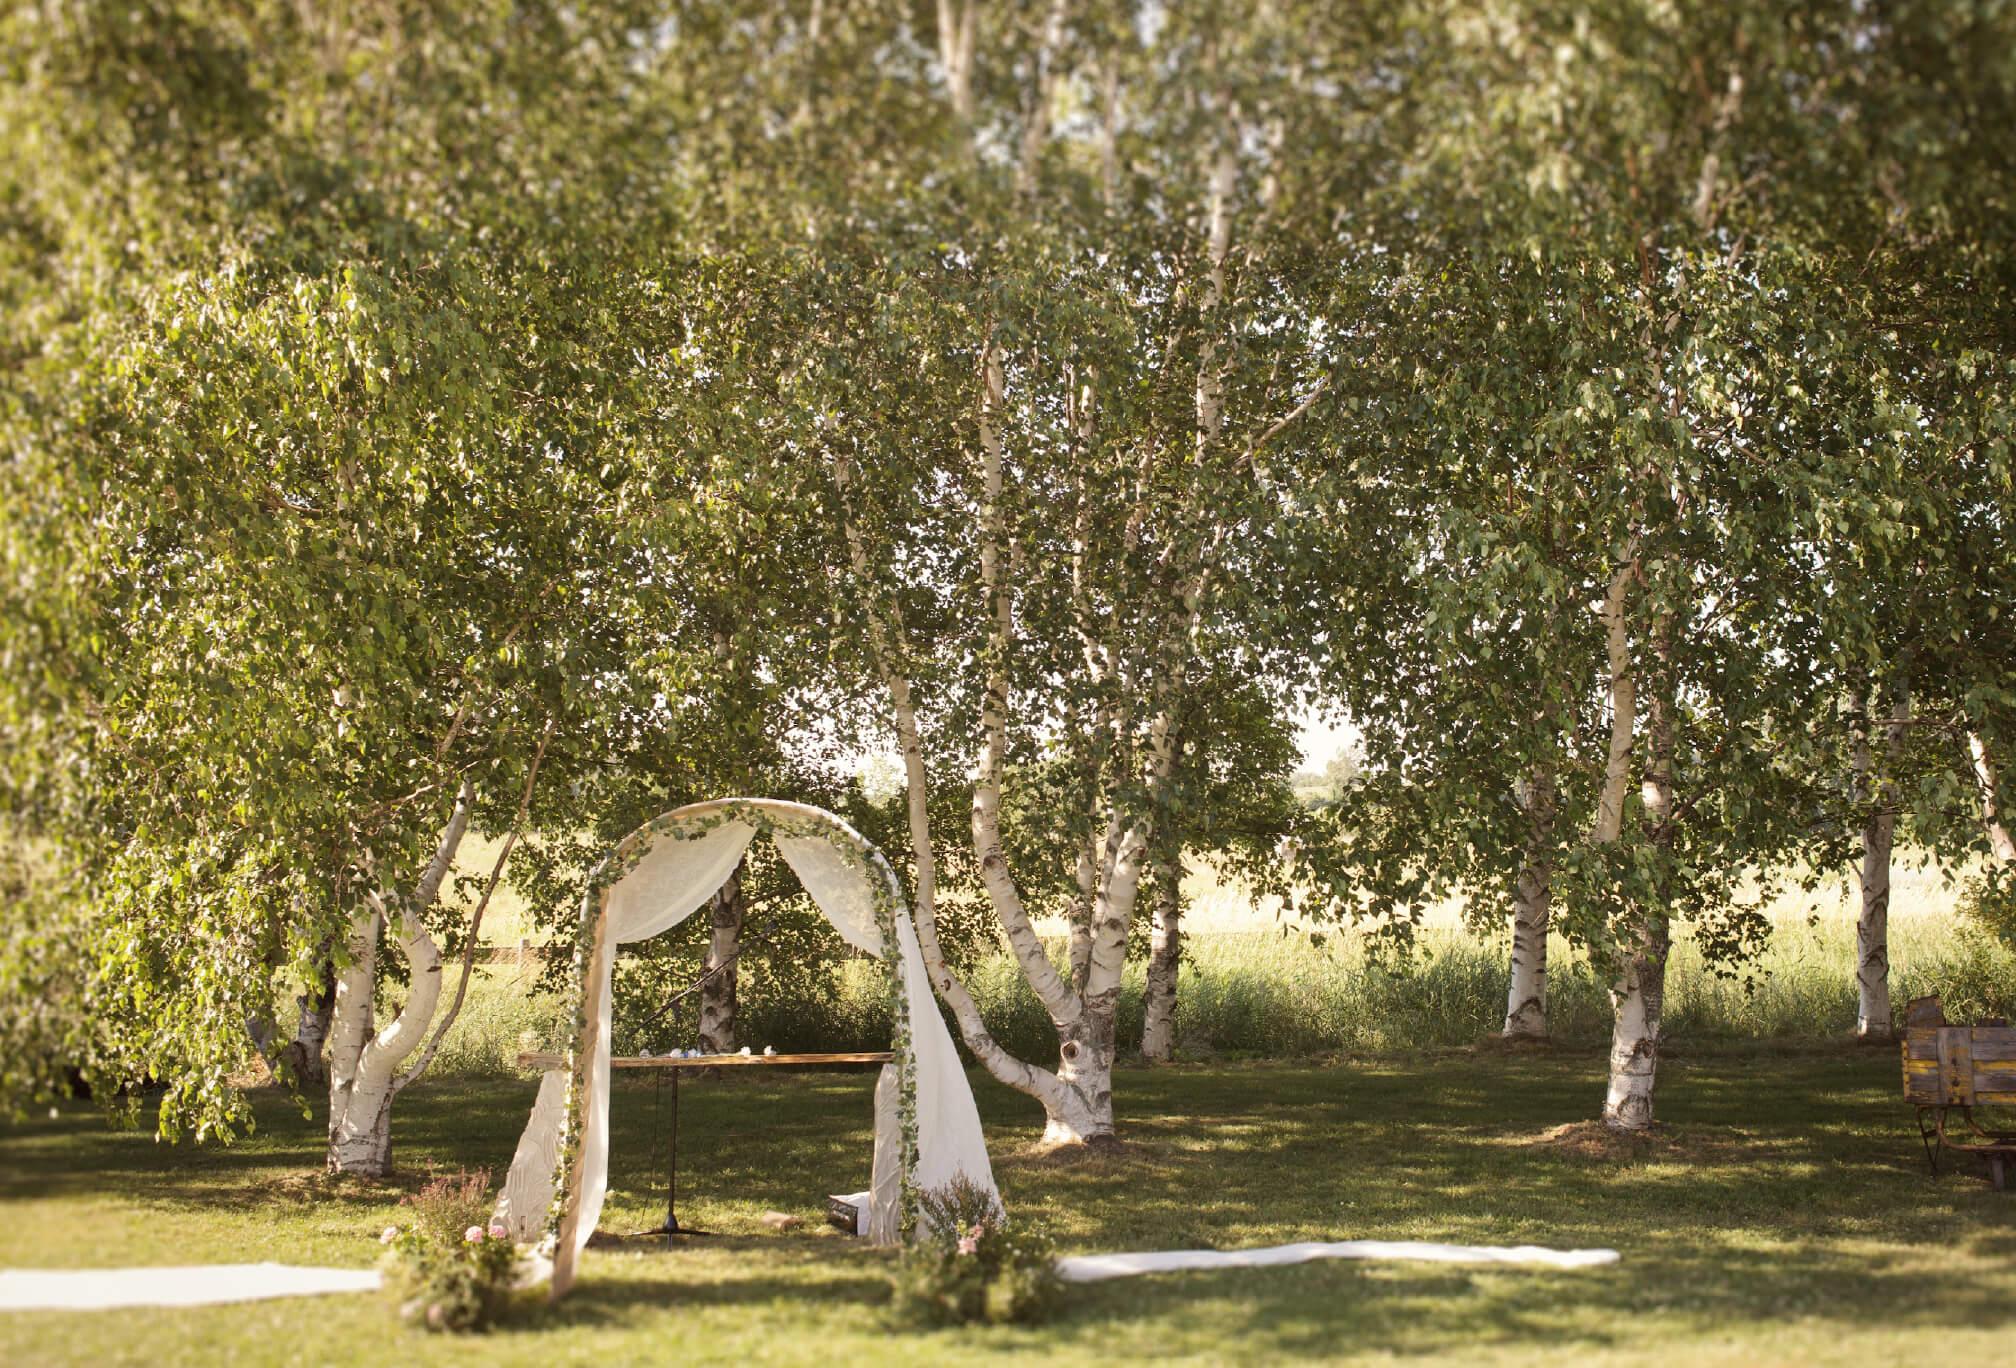 outdoor ceremony arbor in birch trees